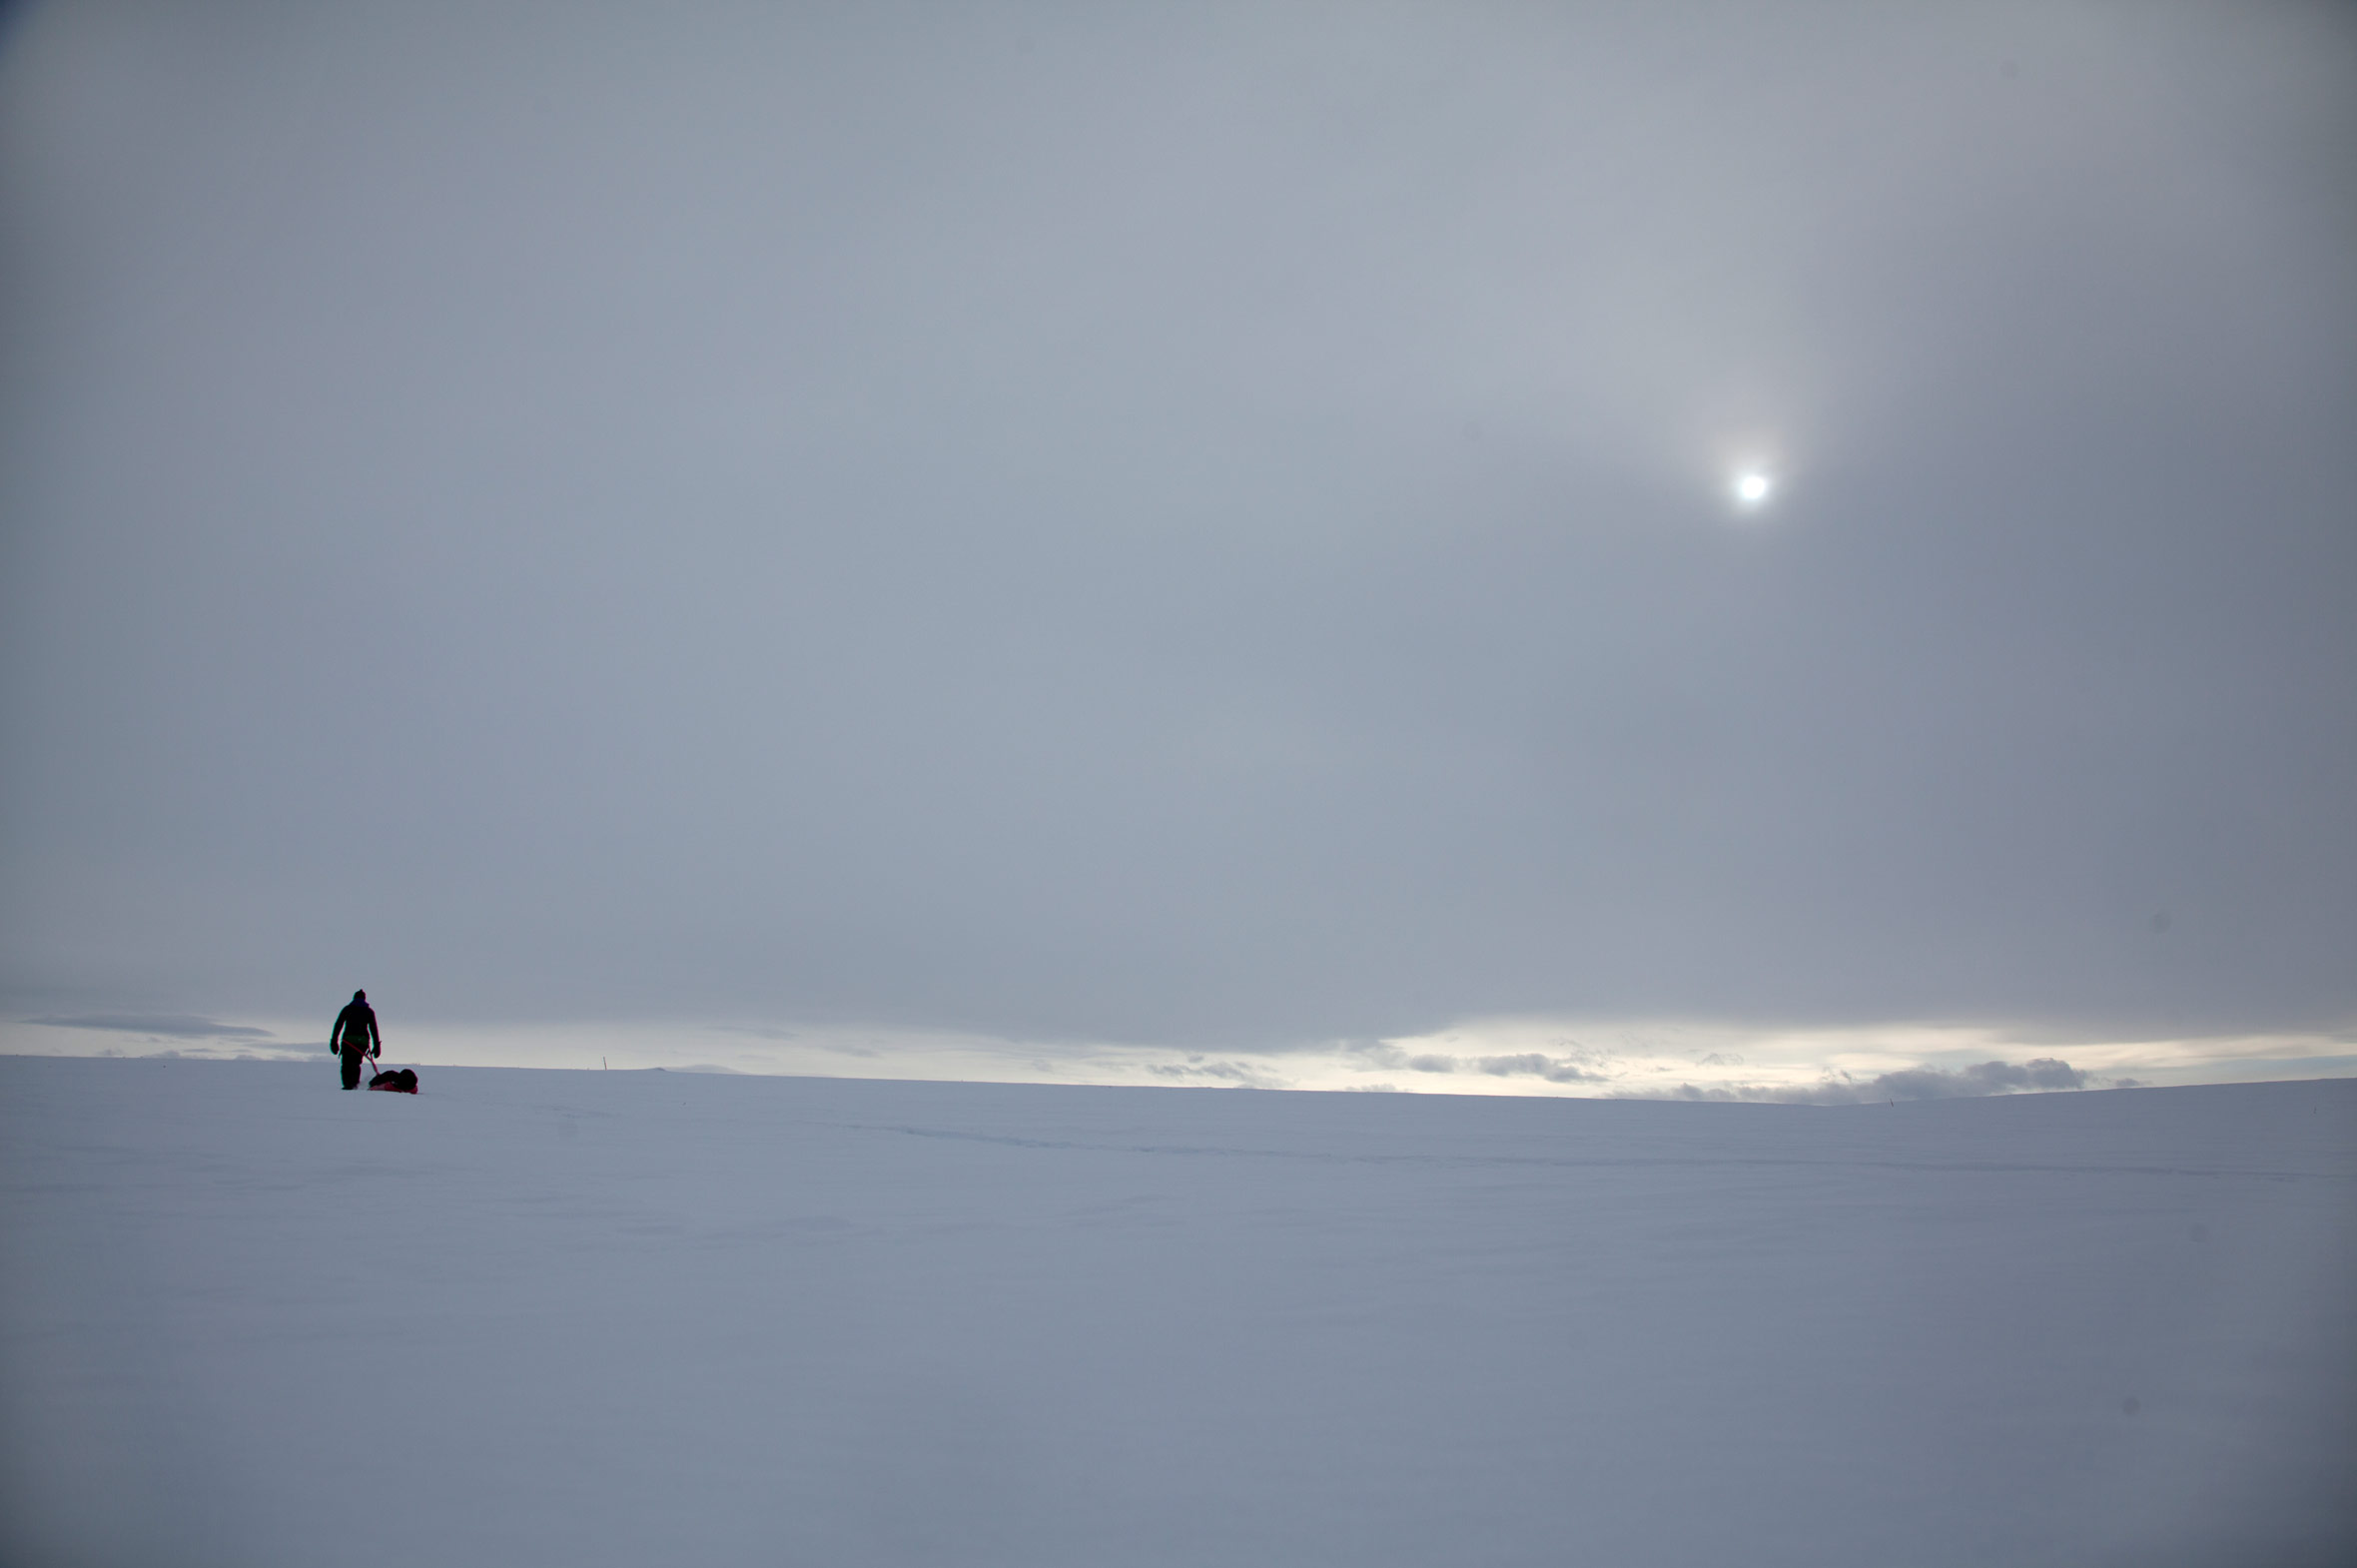 Toolik Field Station in Alaska. Photo: Marcin Szczepanski, Michigan Engineering.